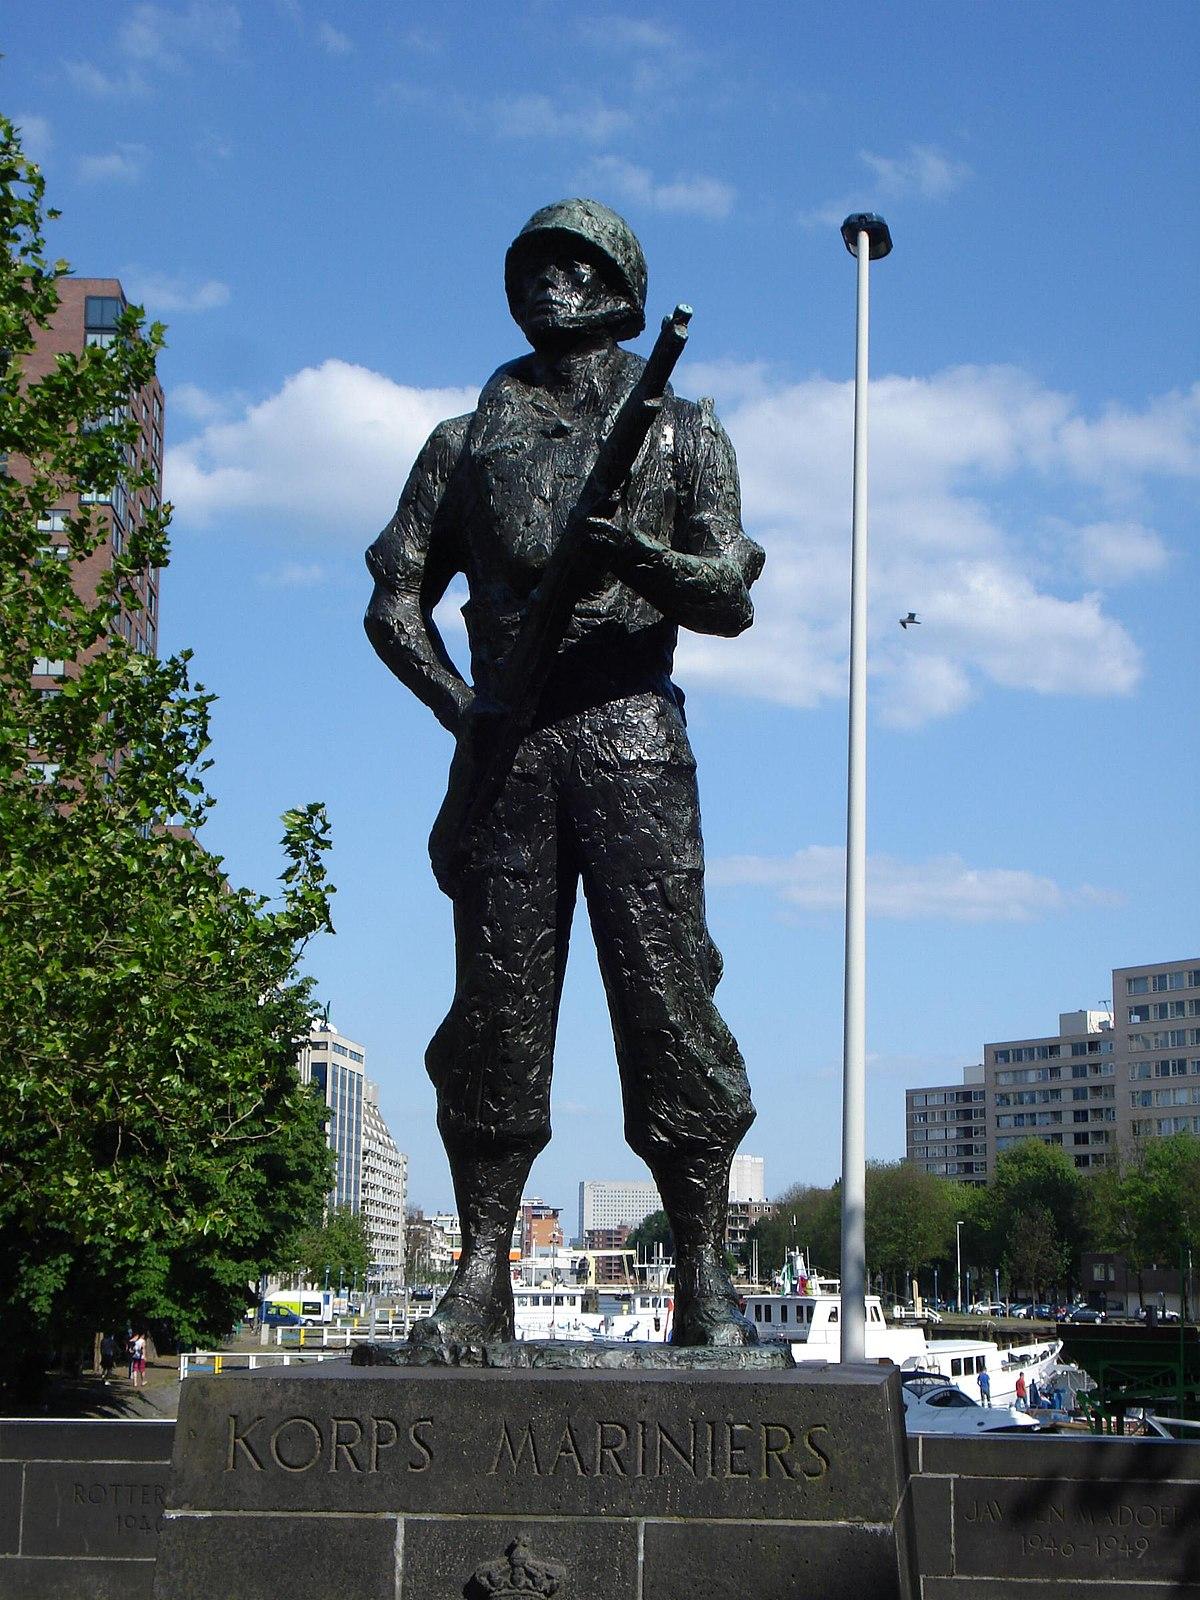 Korps Mariniers Wikipedia